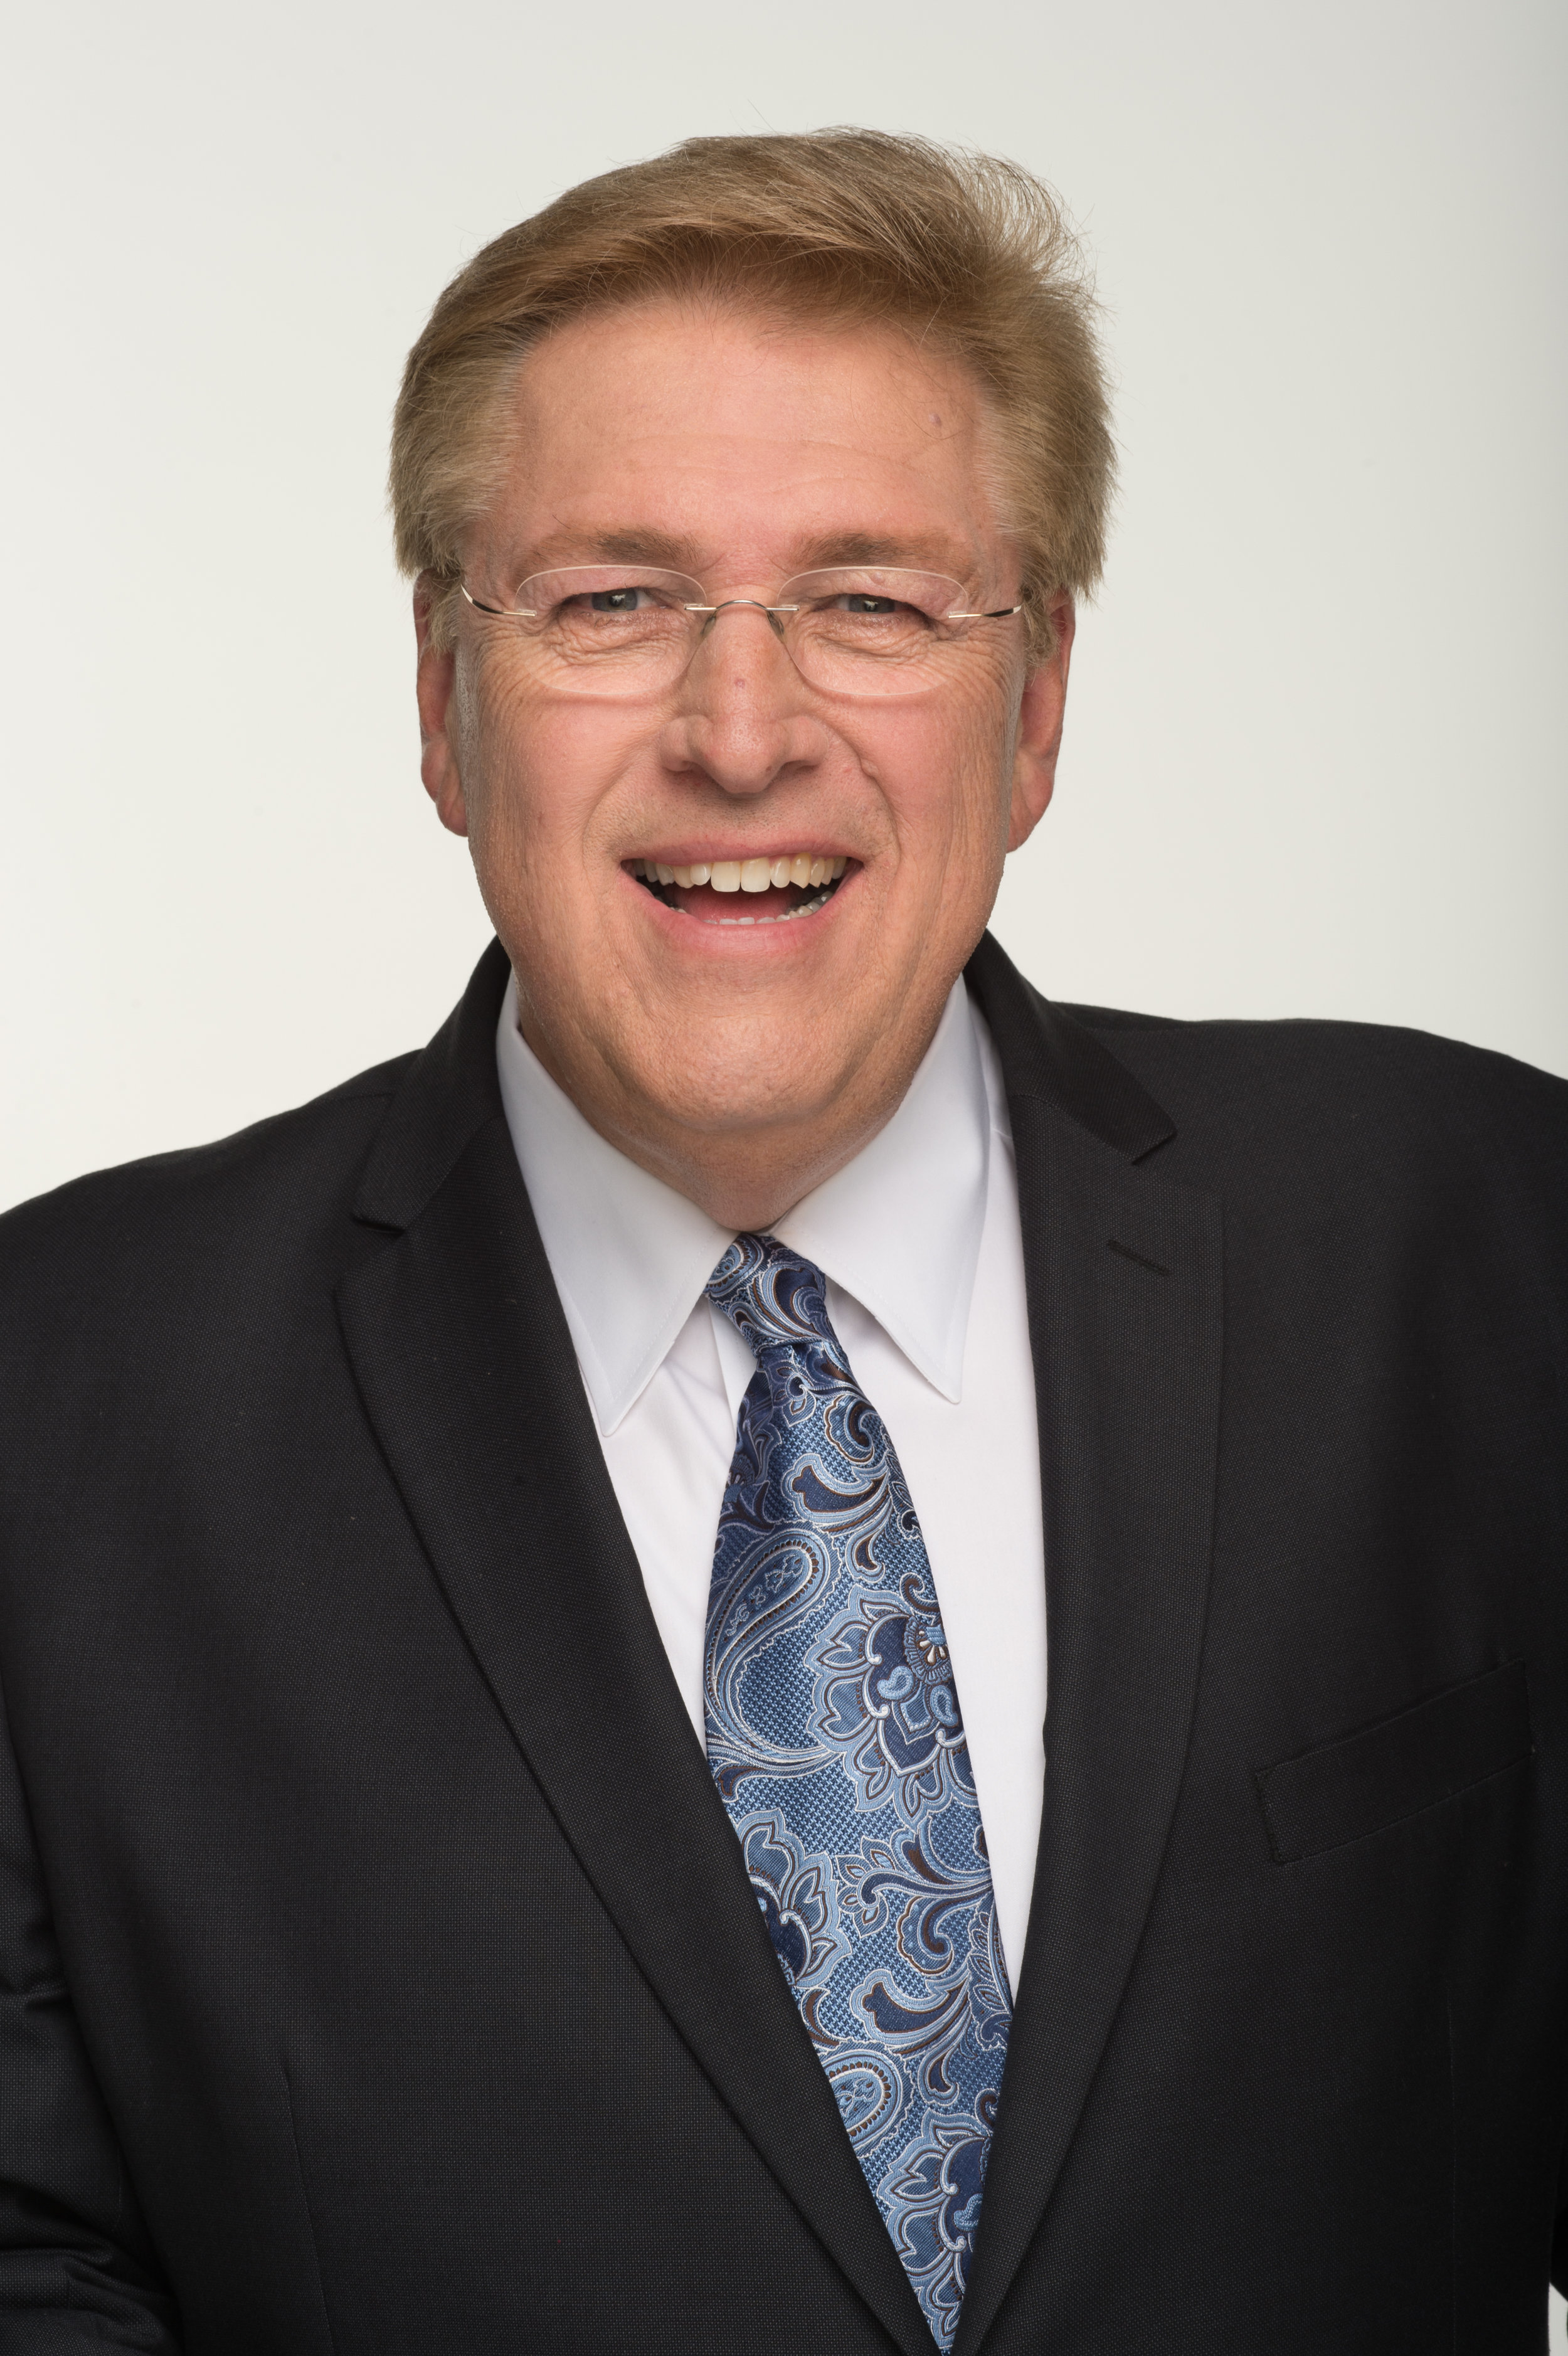 J. Rick Webb